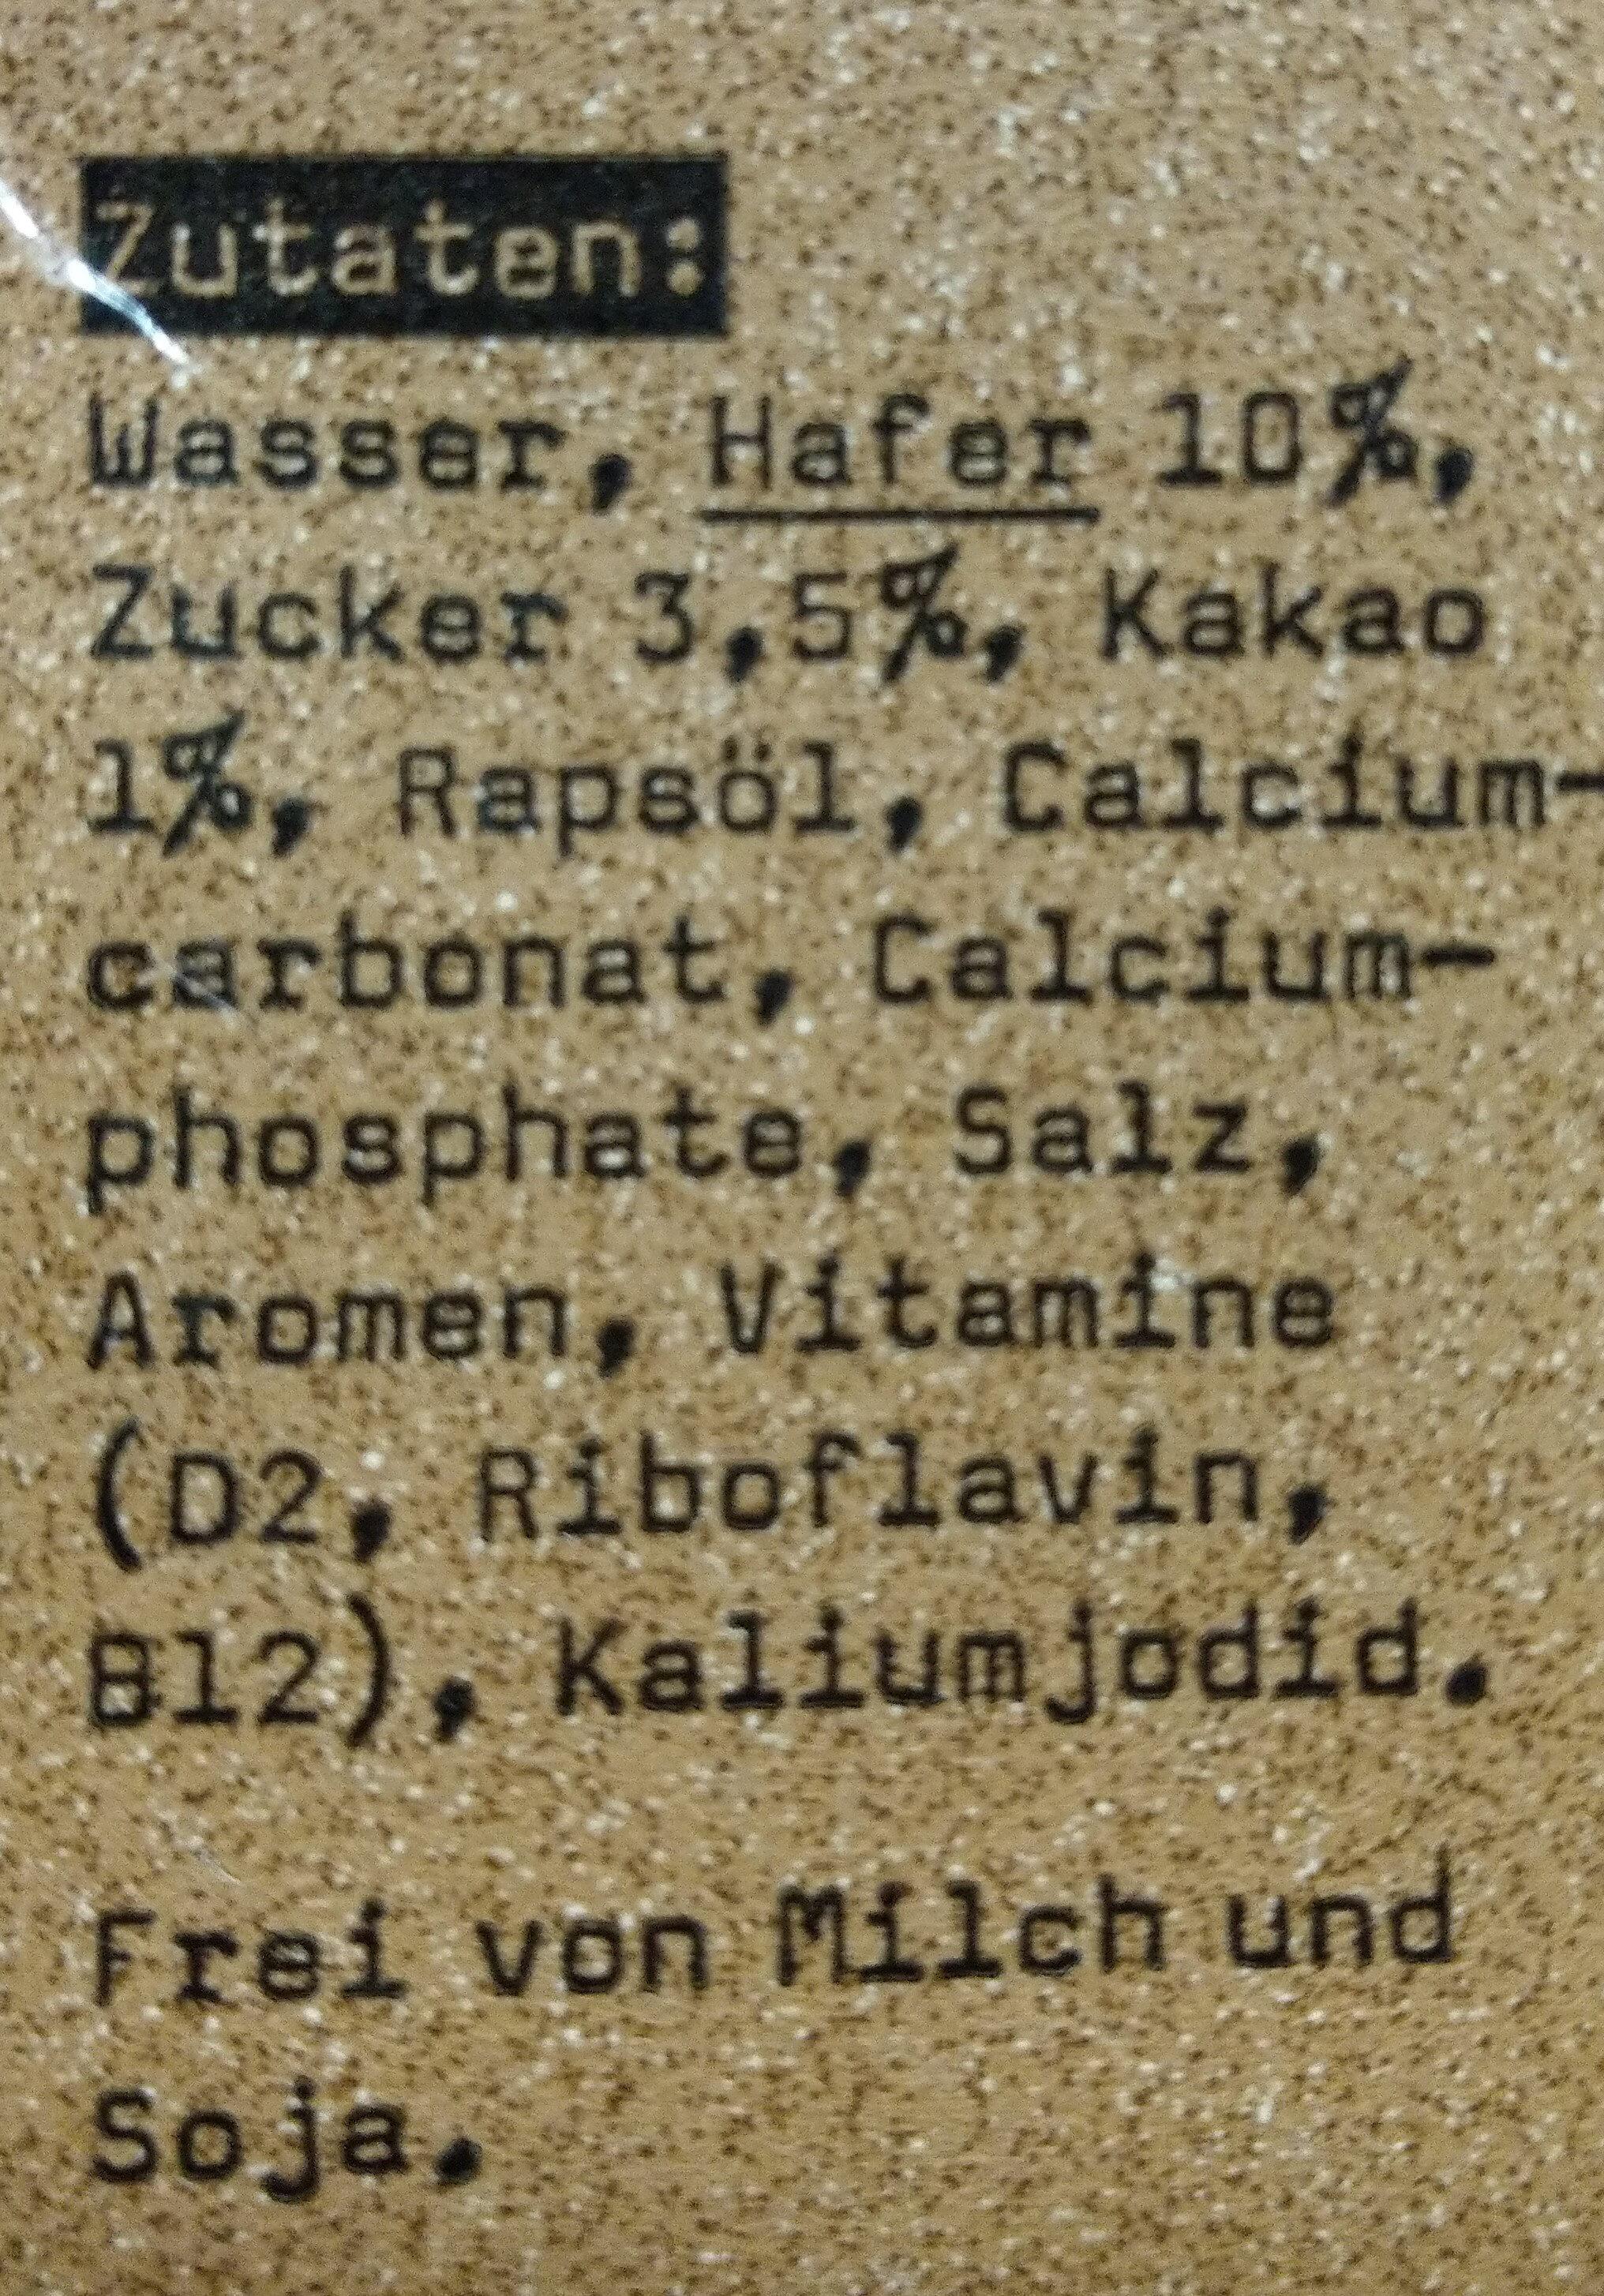 Hafer Avoine Cacao - Ingredients - fr